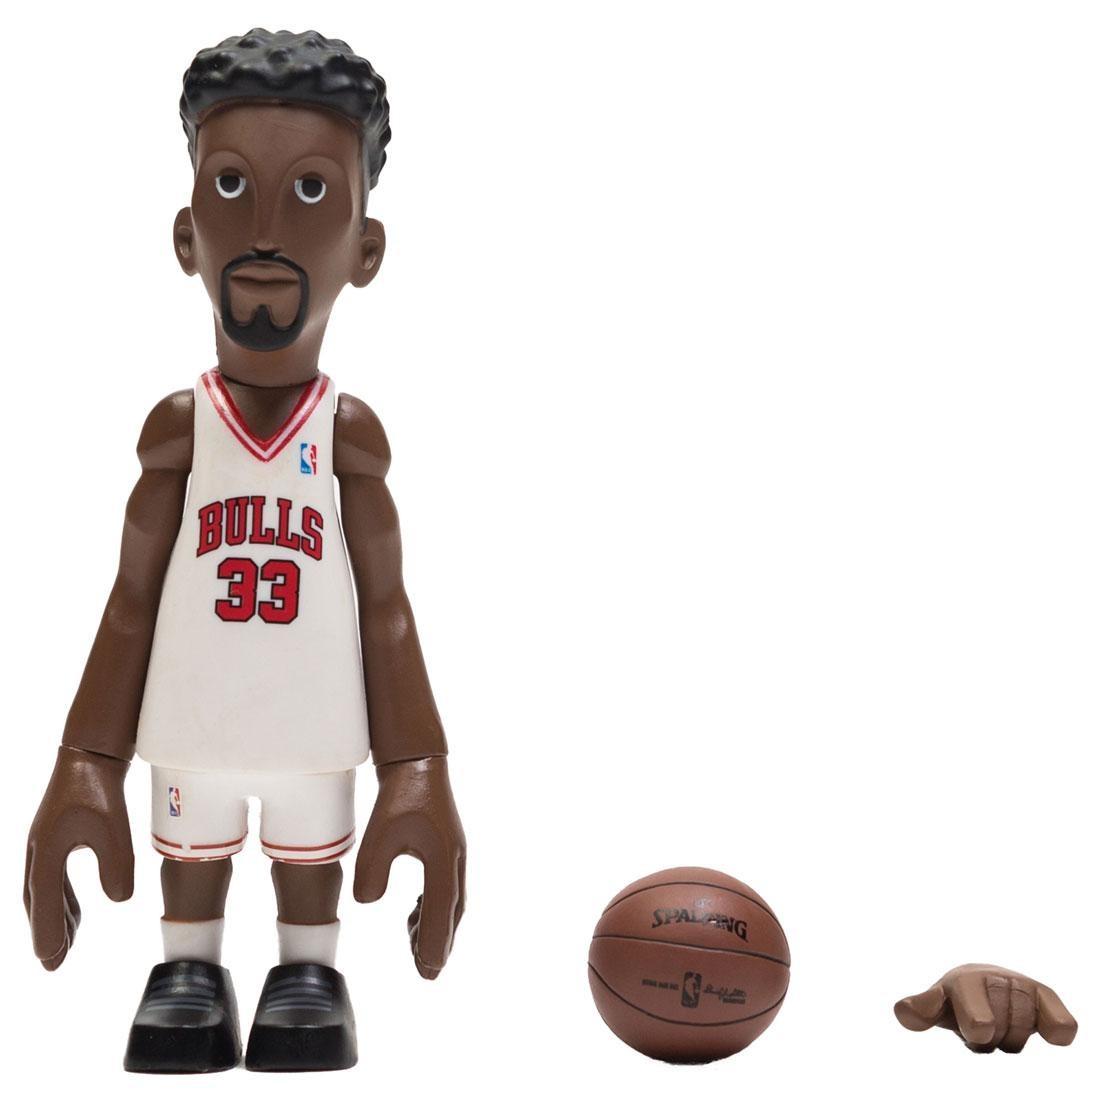 MINDstyle x Coolrain NBA Legends Chicago Bulls Scottie Pippen Figure (white)